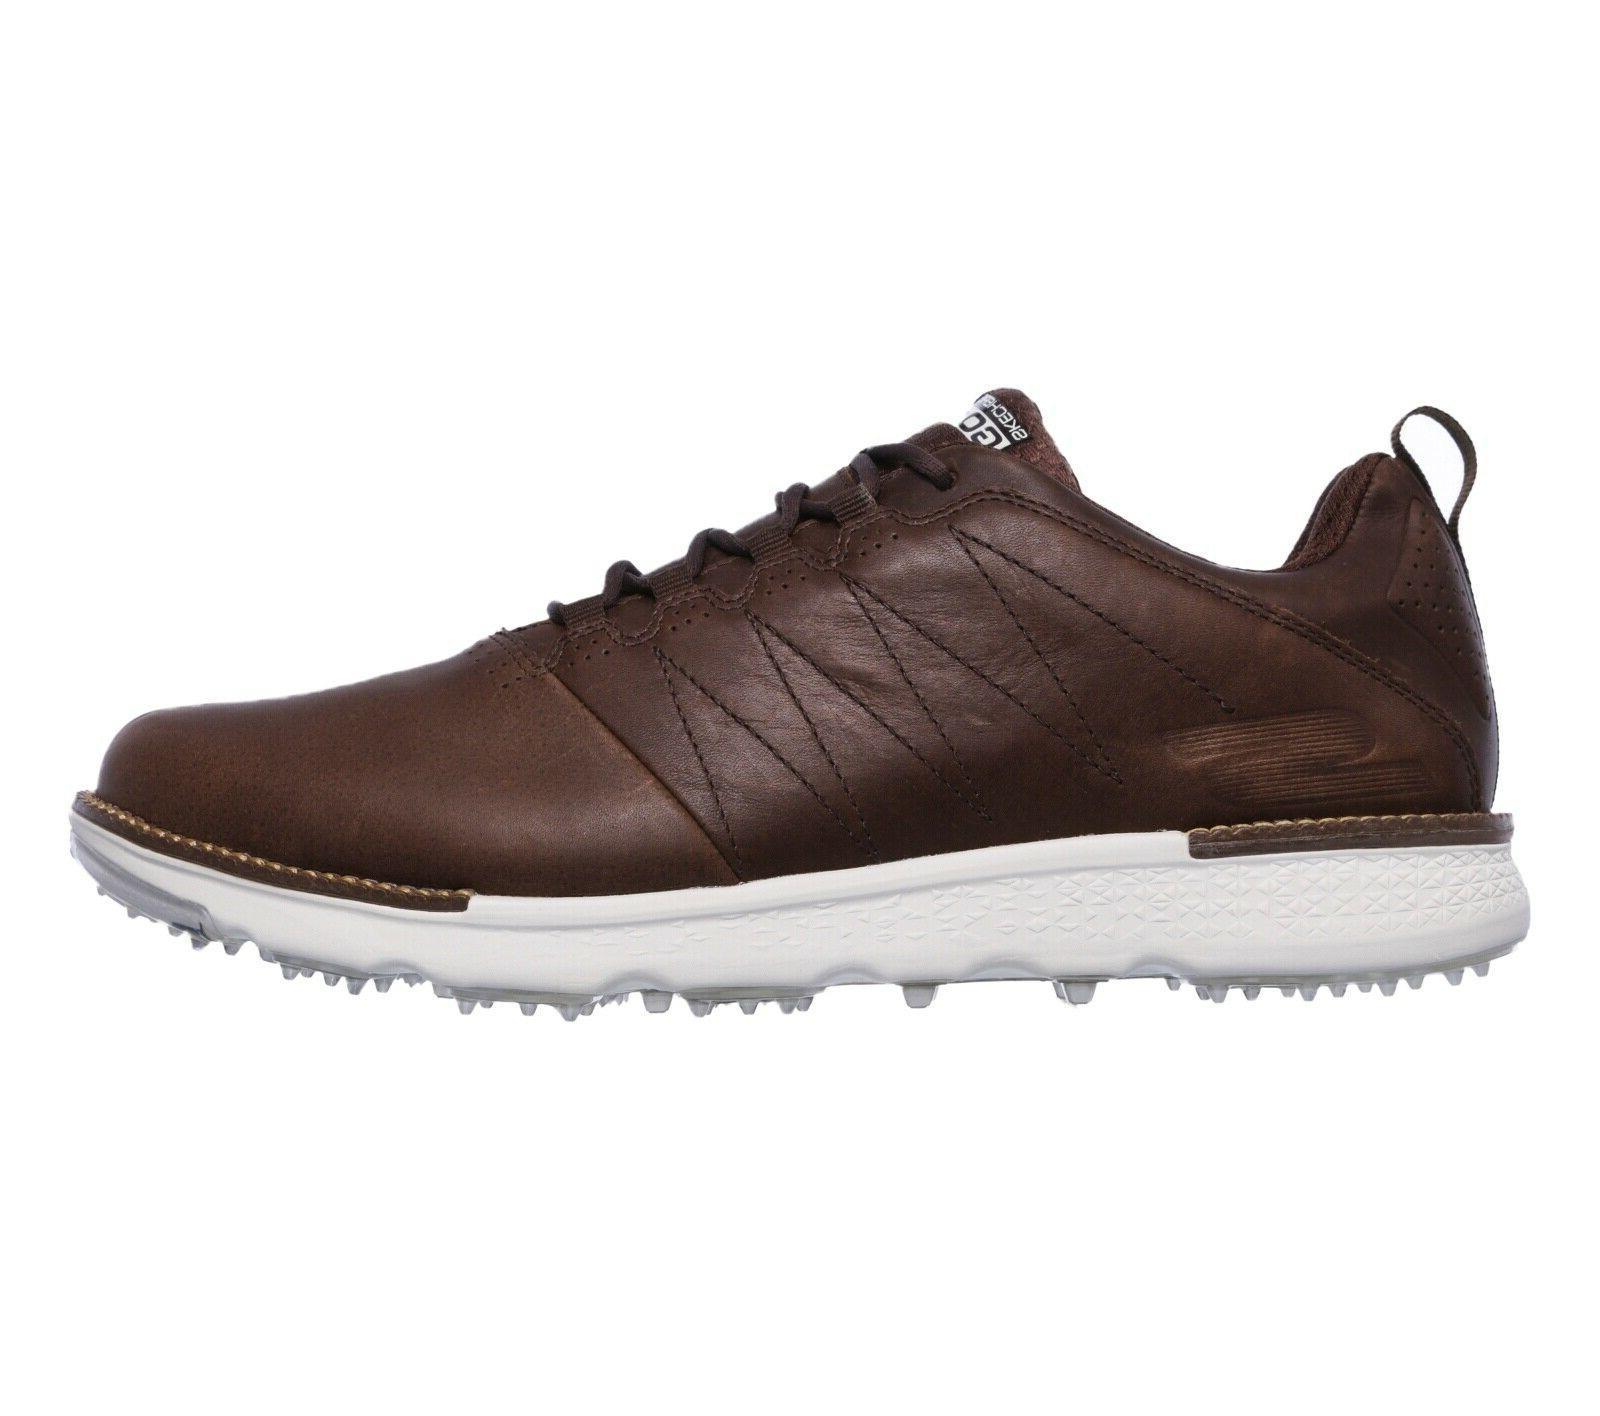 Skechers V.3 CHOC Shoes-Style 54524-CHOC